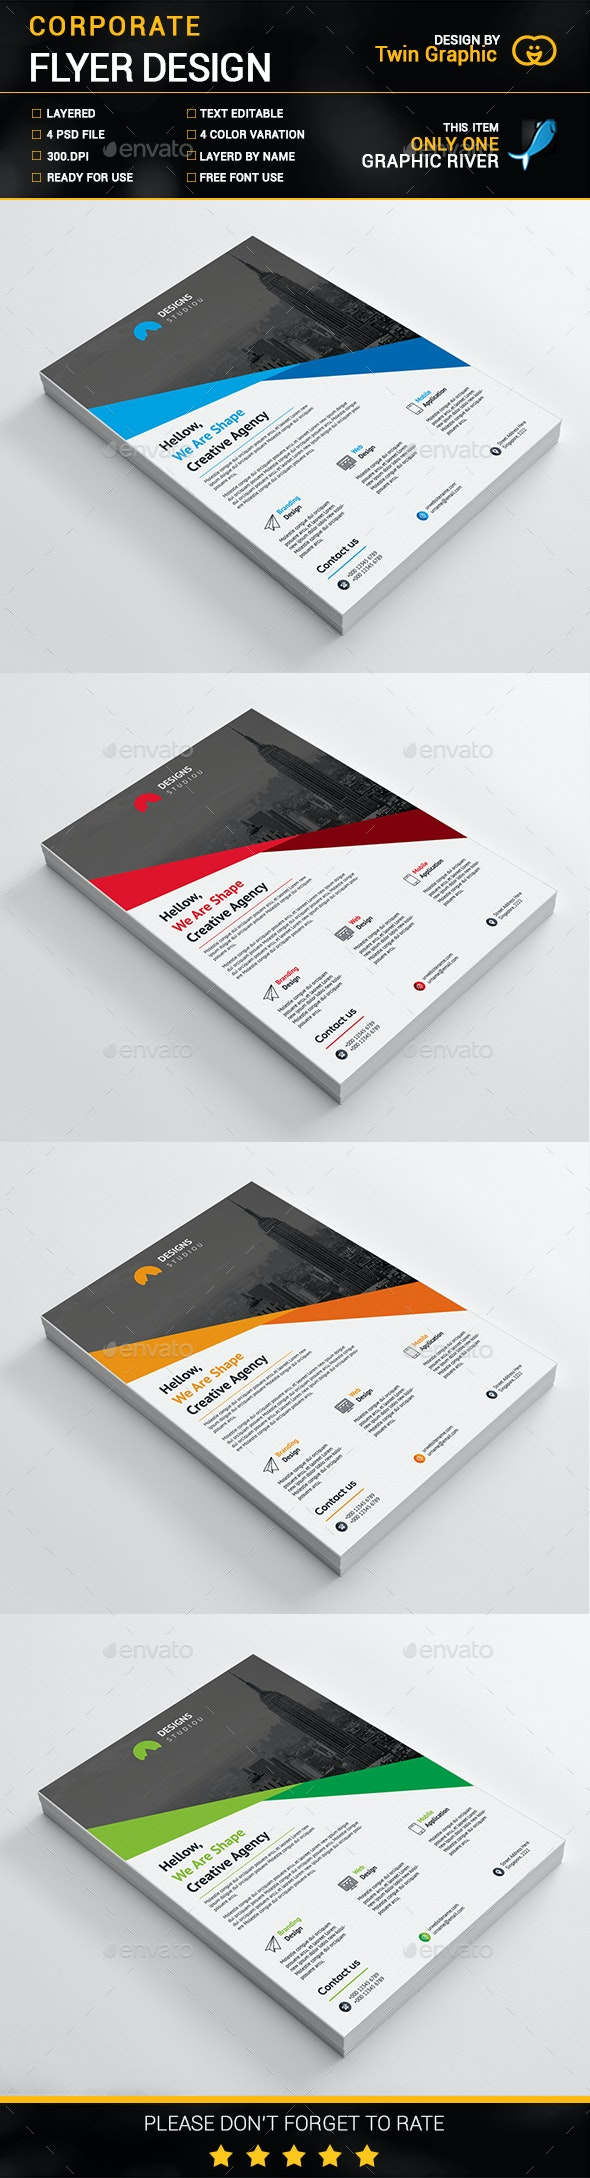 Corporate Flyer Design. - Flyers Print Templates